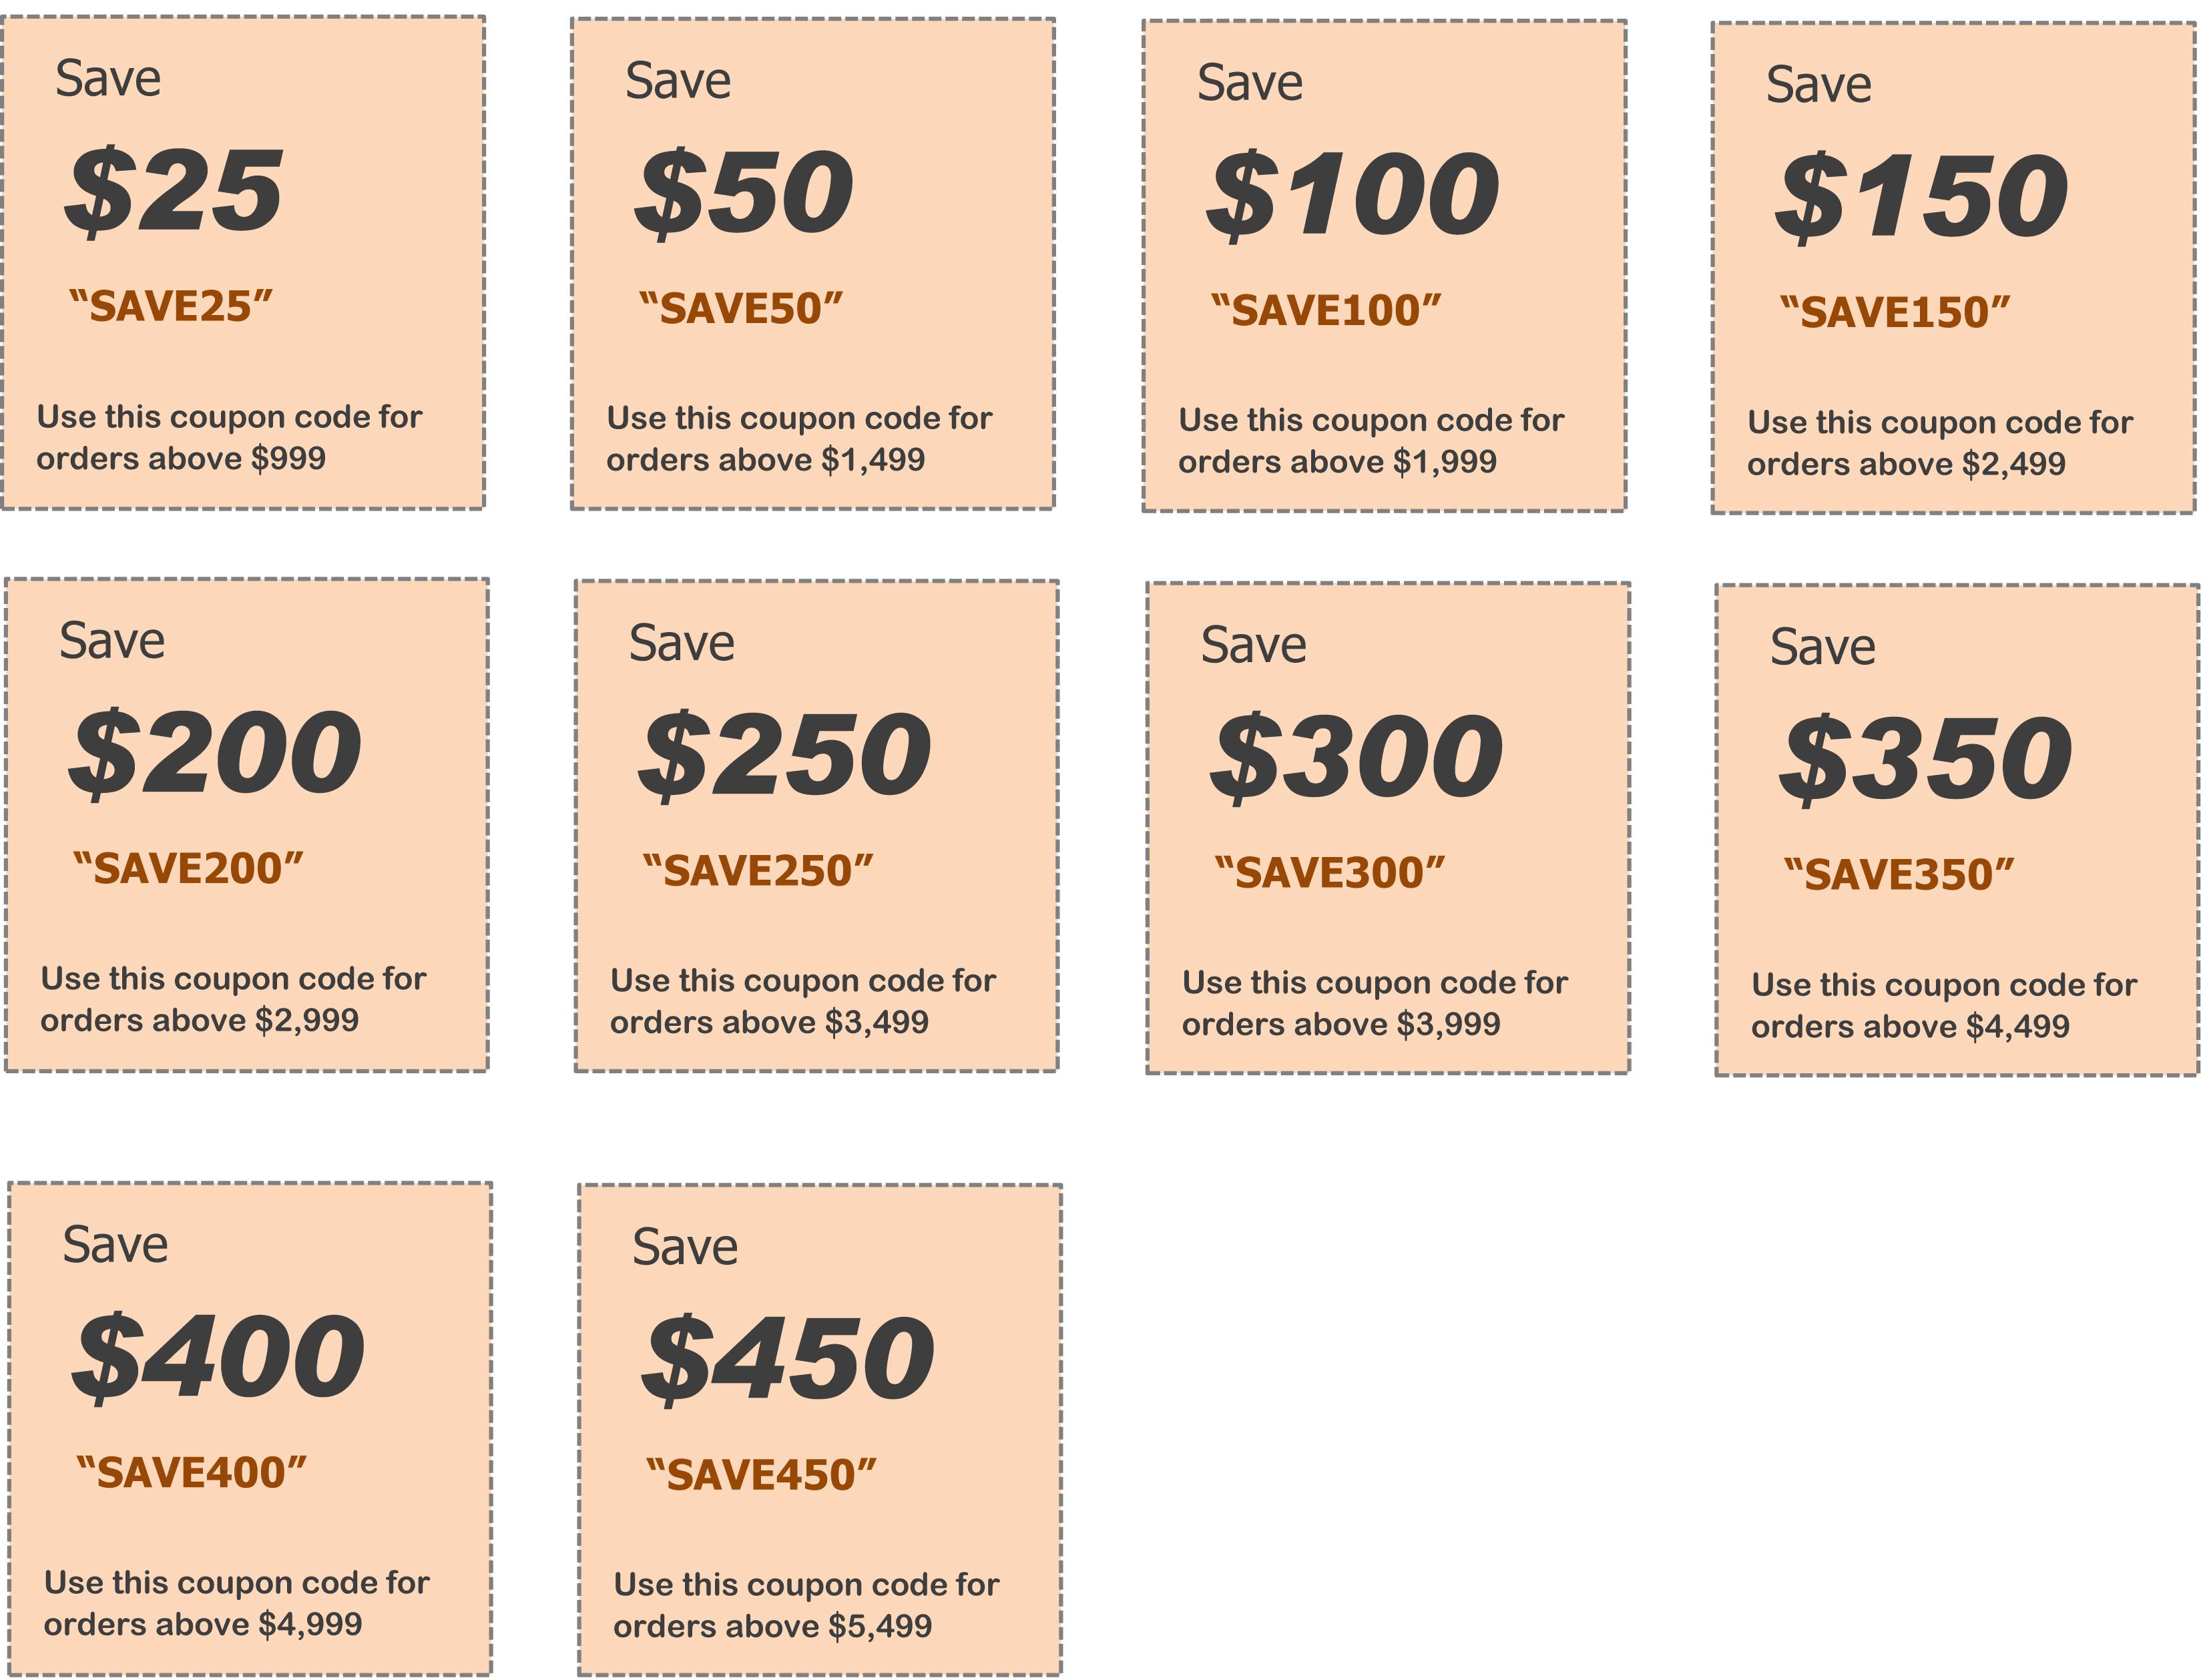 jbb-coupon-codes-page-revised-2021.jpg